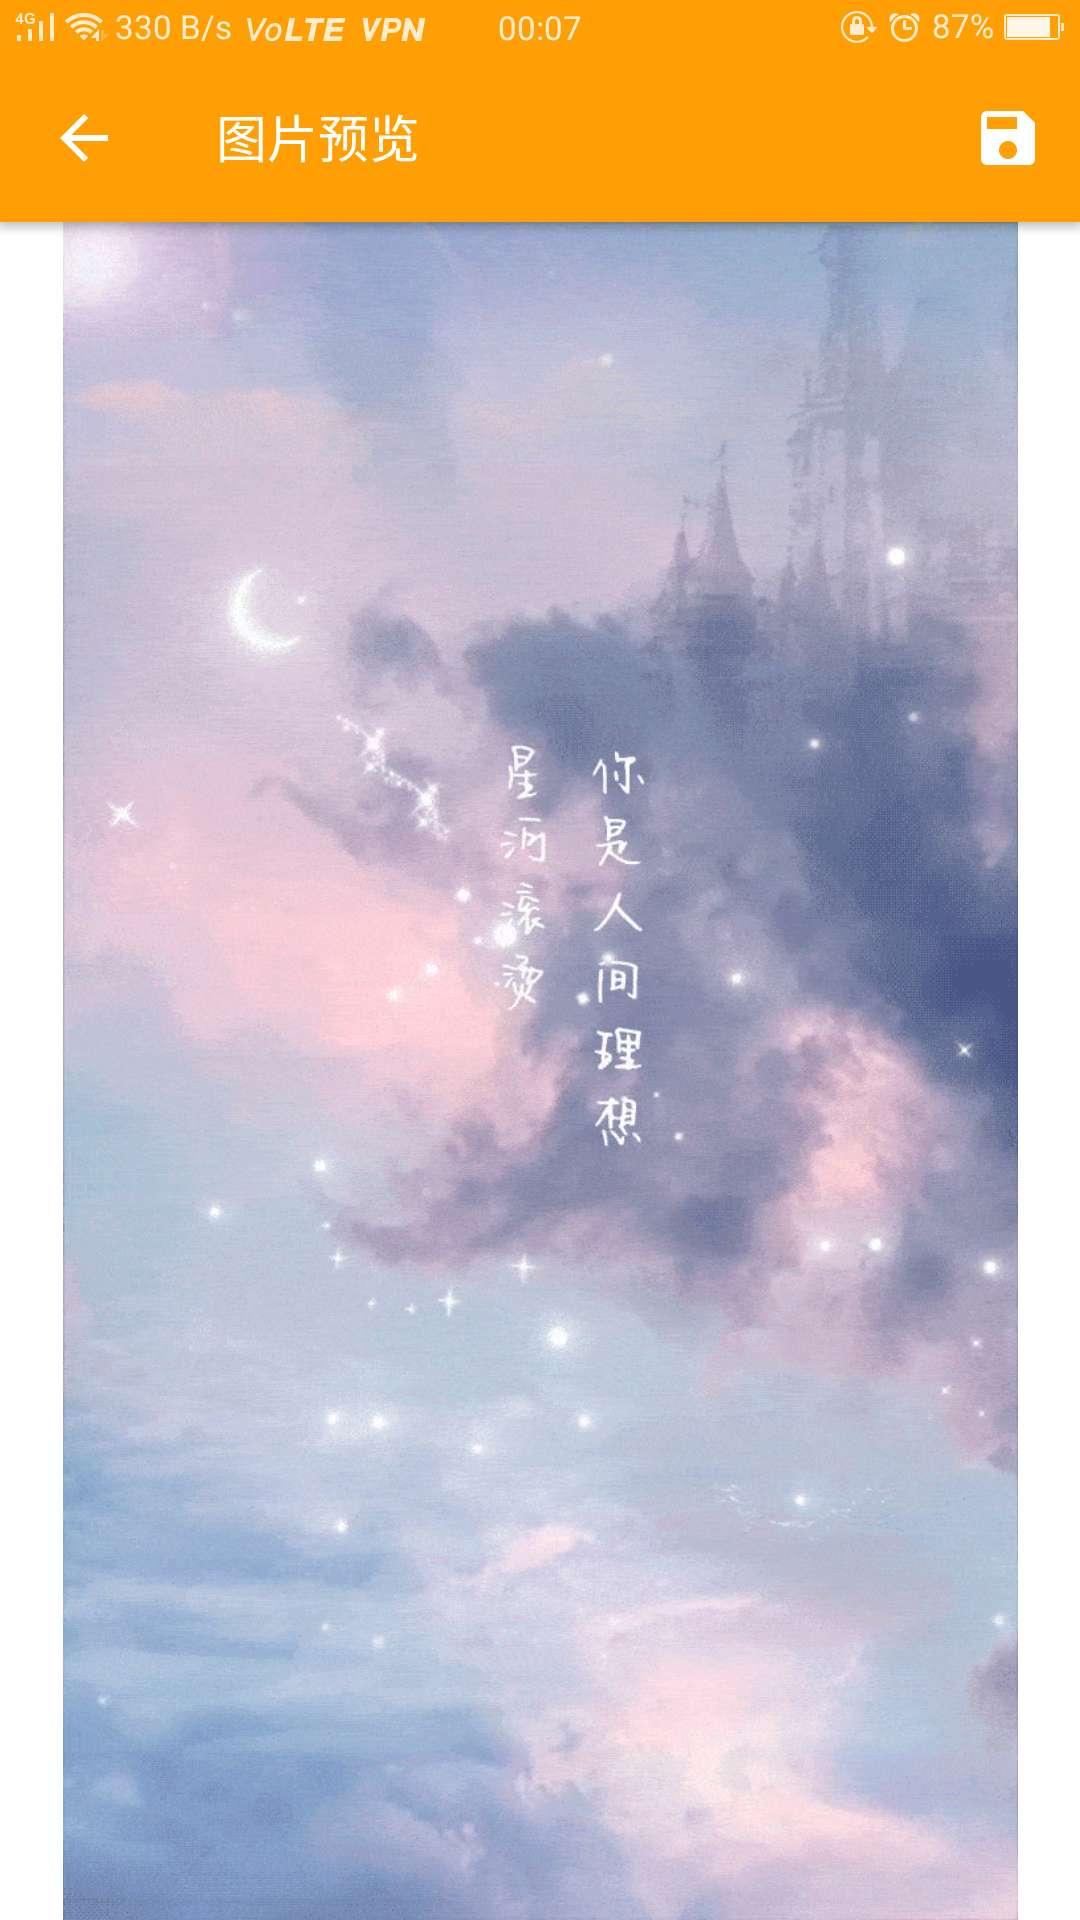 httpcanary抓包qq背景图片成功-www.im86.com